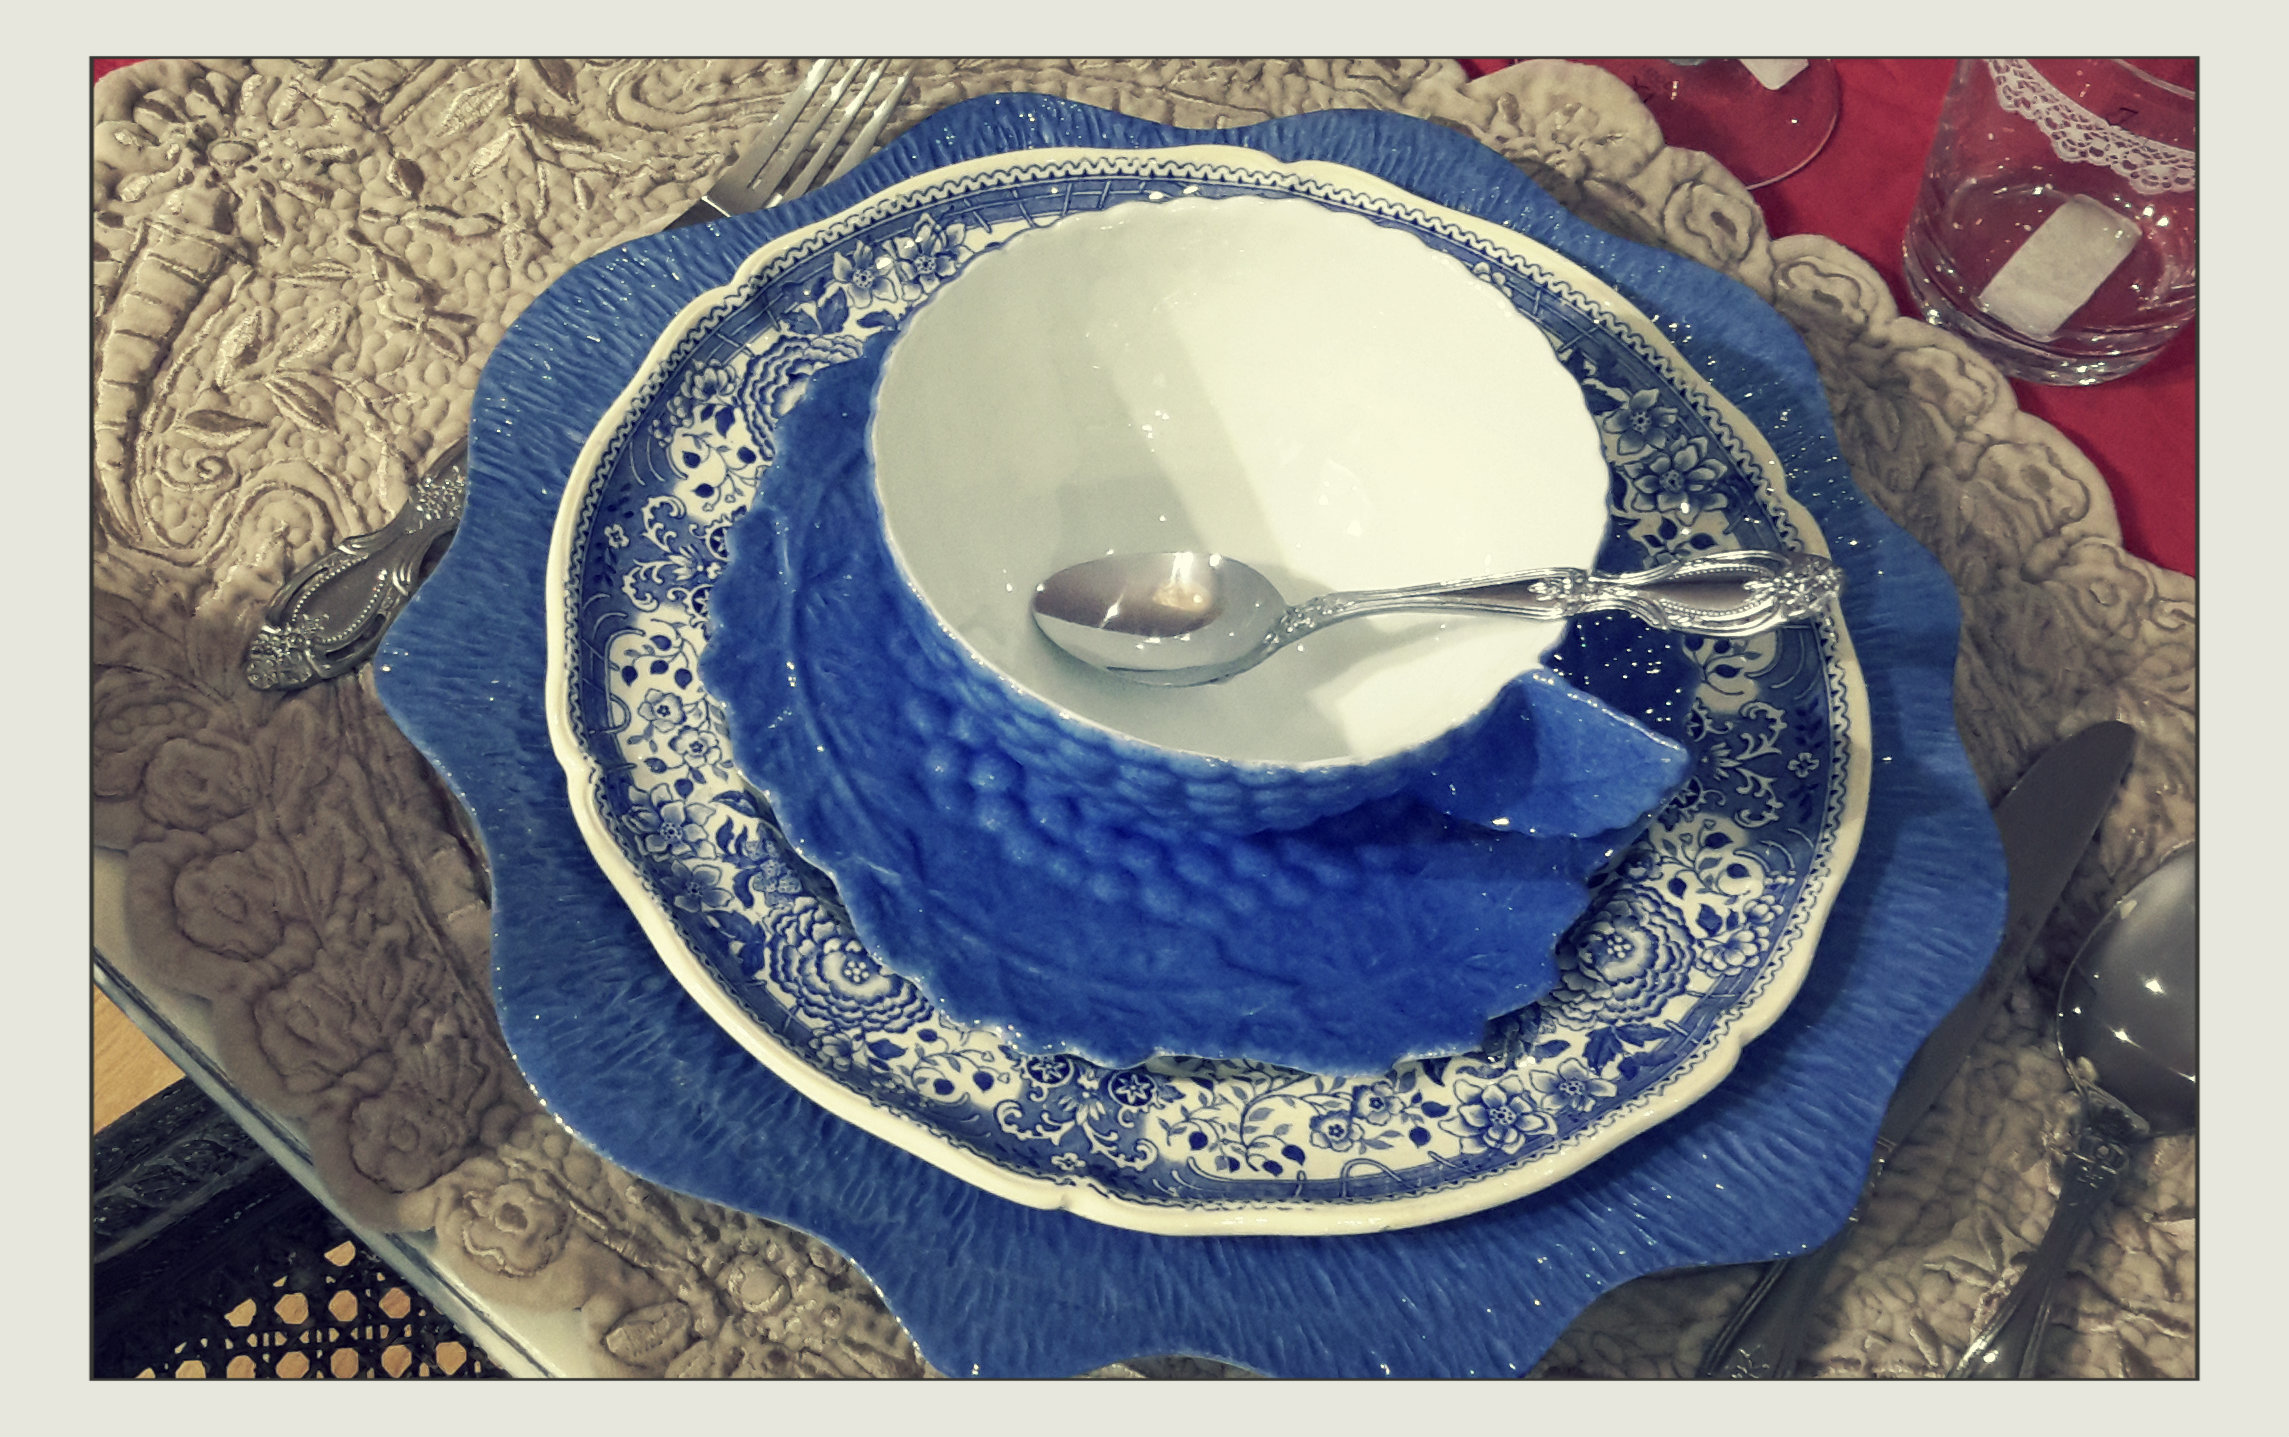 brocante vaisselle chinée villeroy&boch